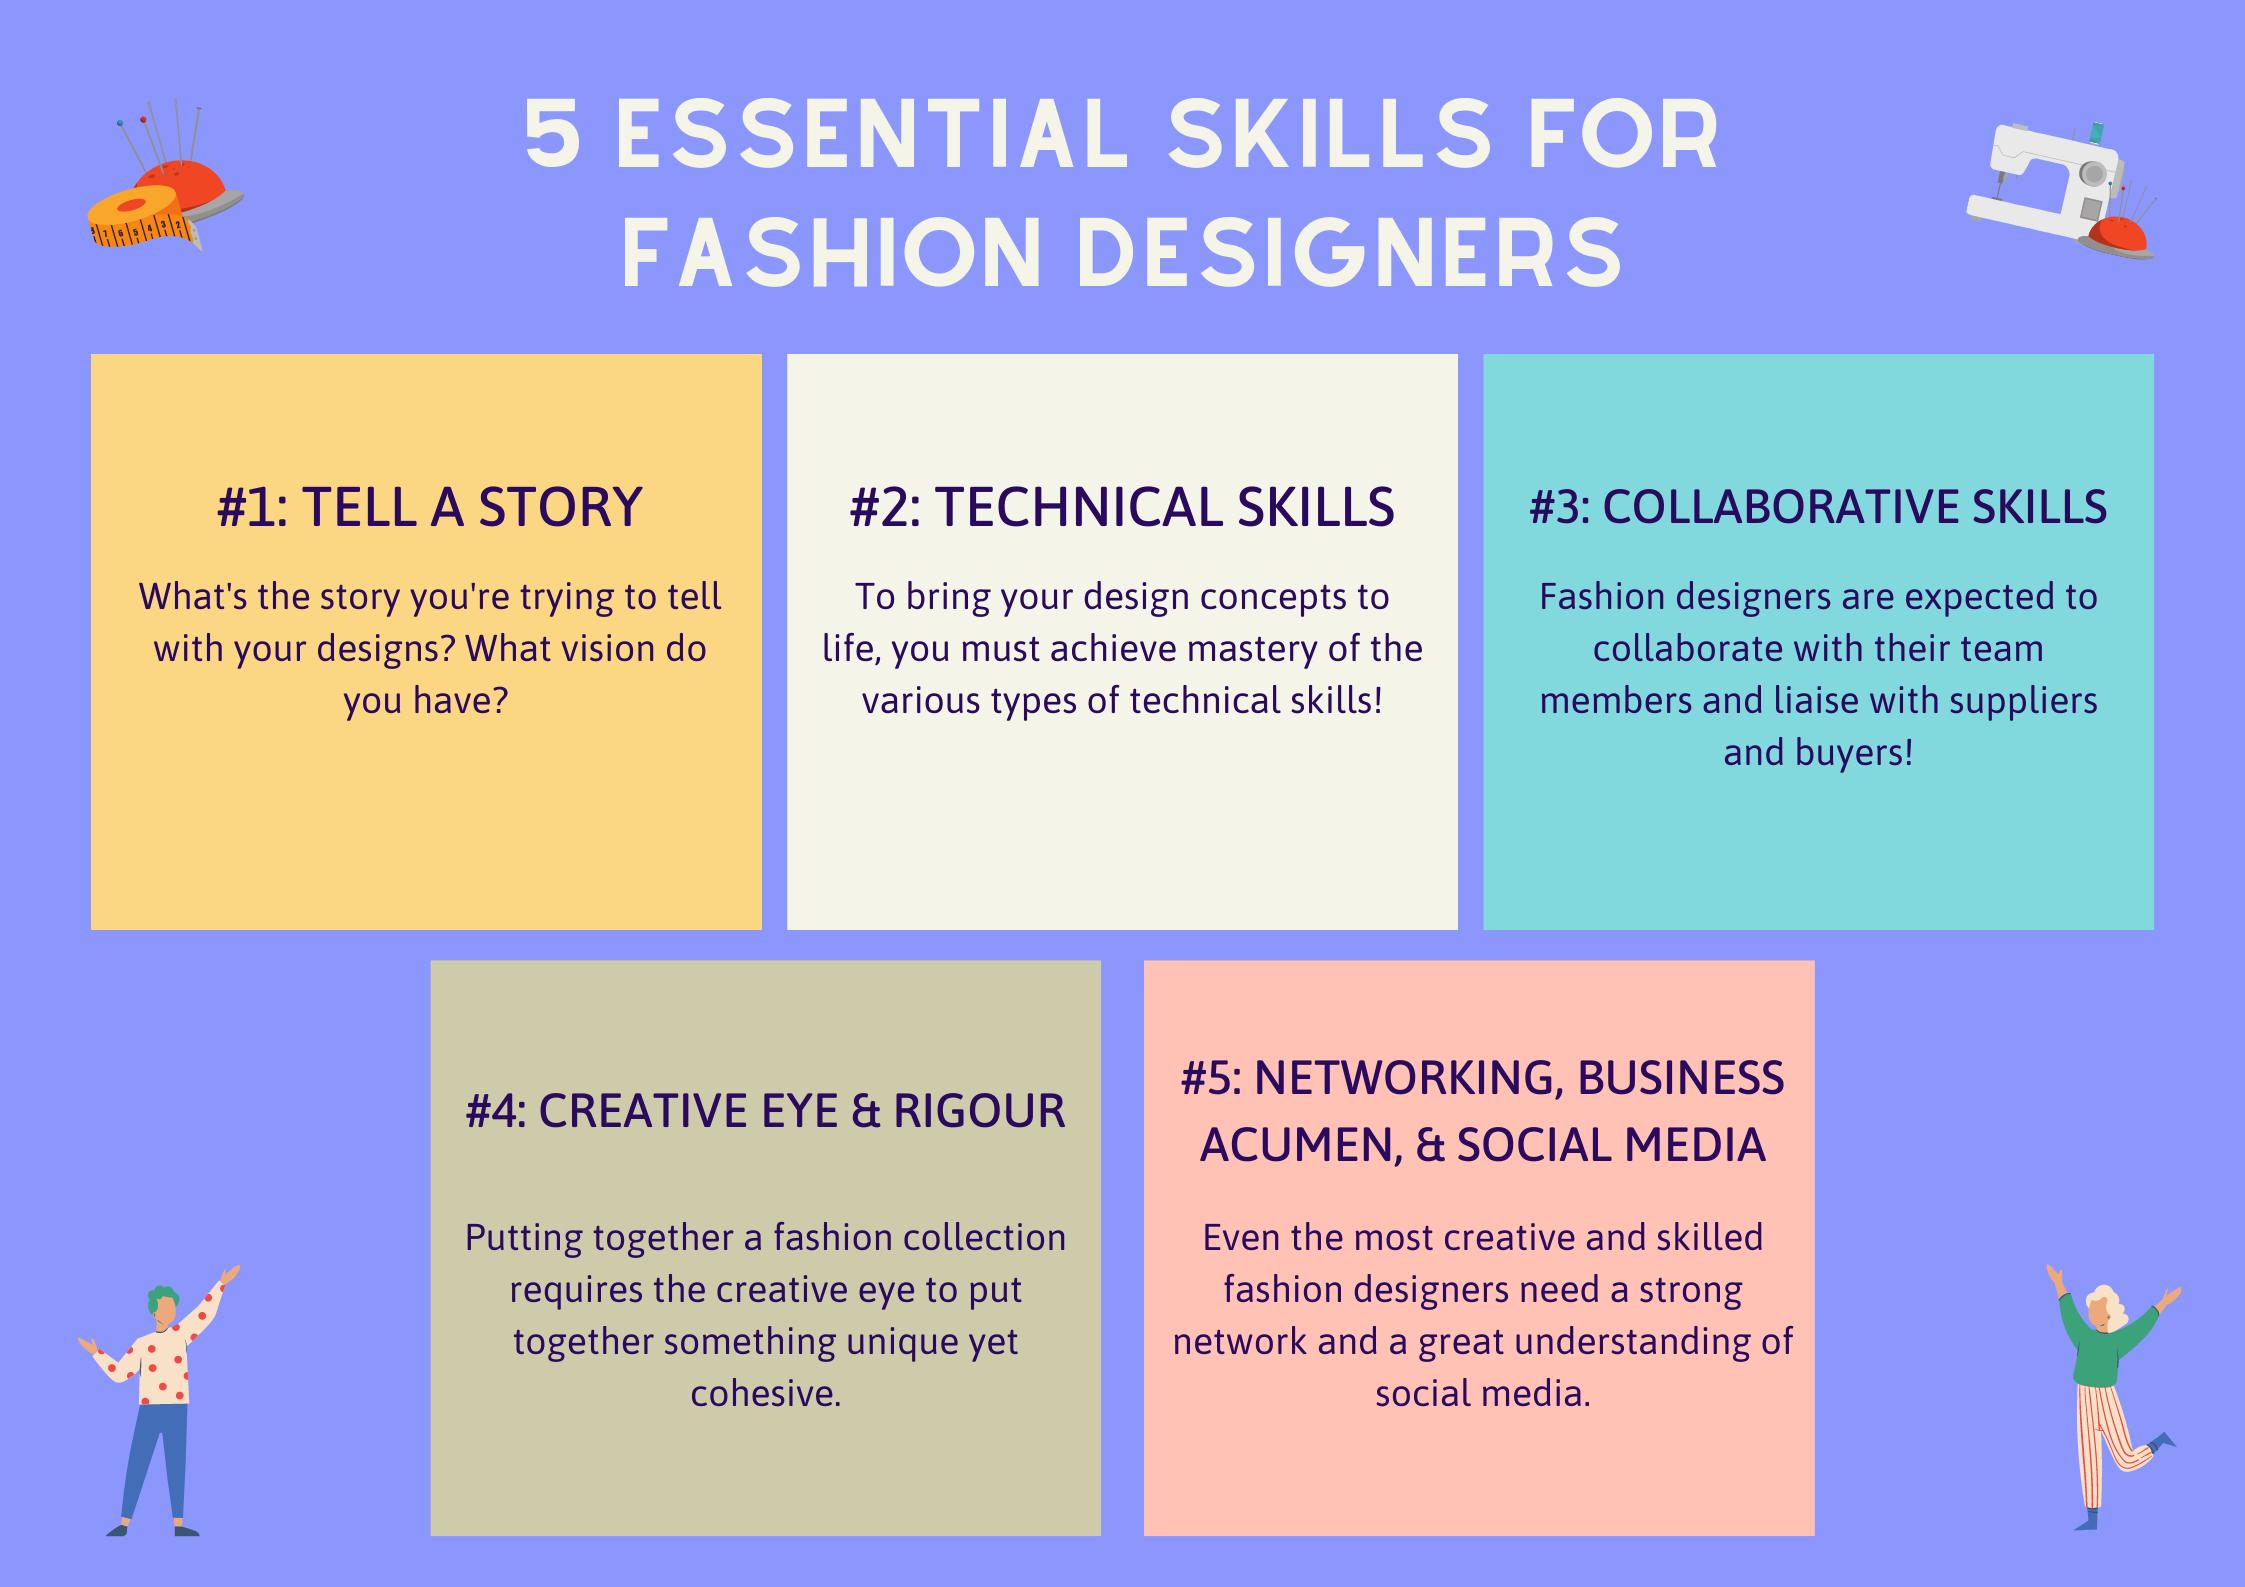 5 Essential Skills for Fashion Designers